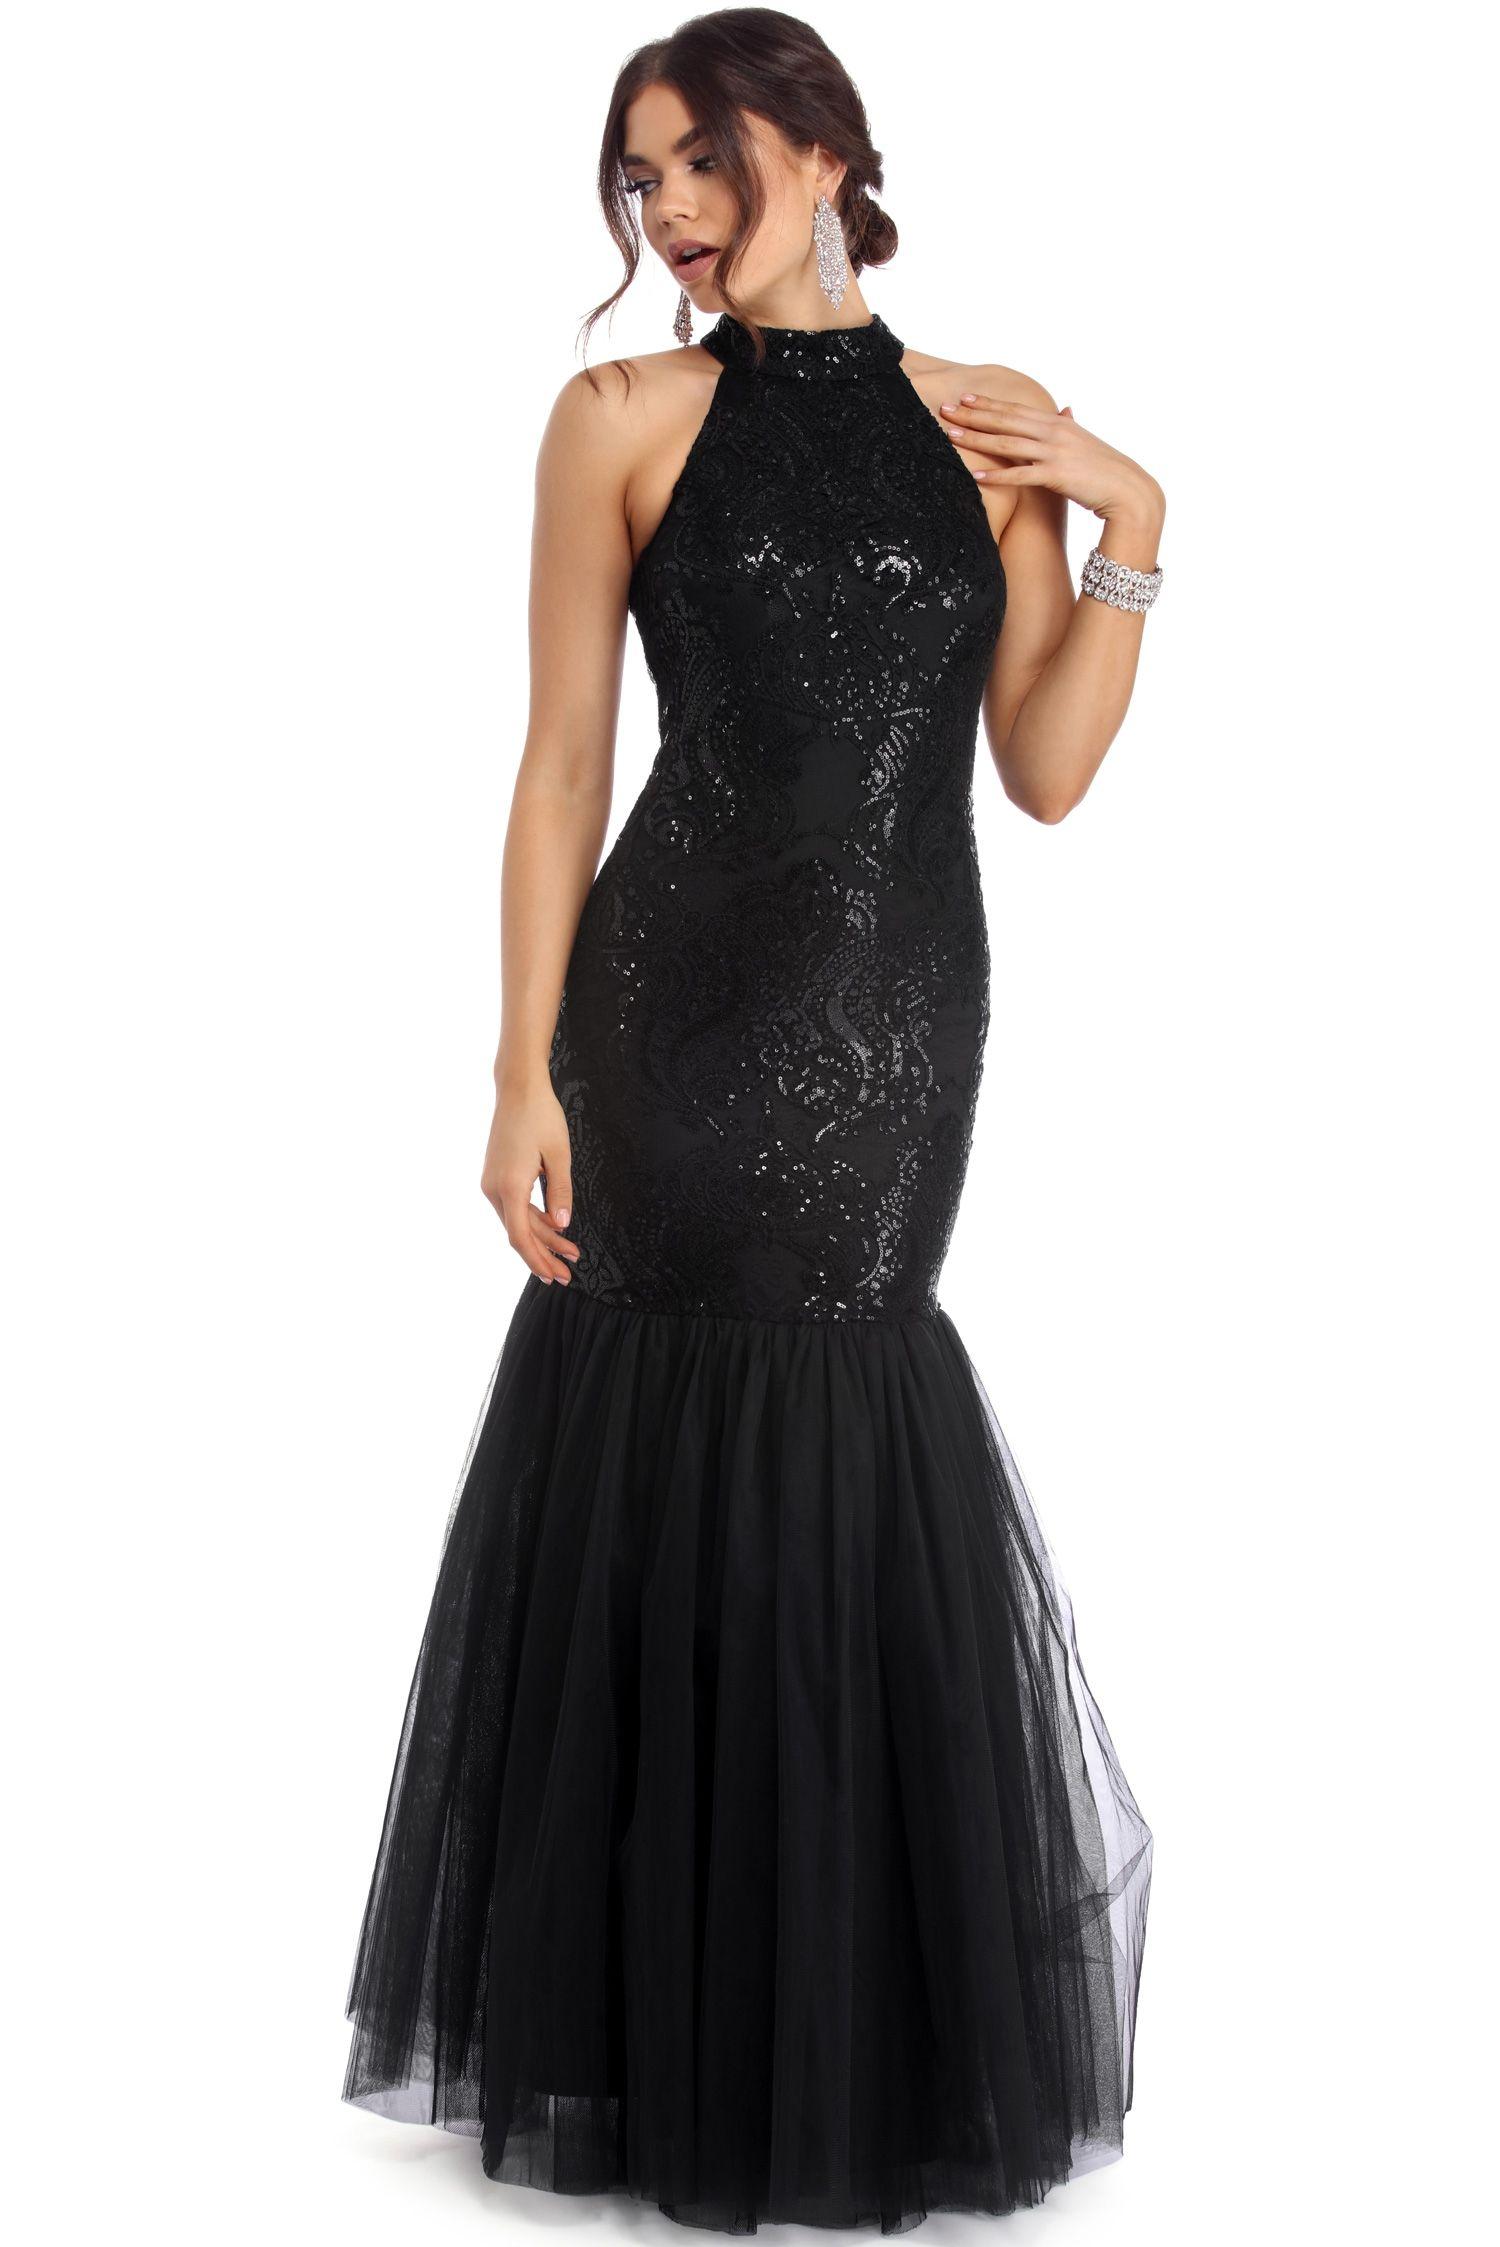 Amorose black sequin mermaid dress womens prom dresses